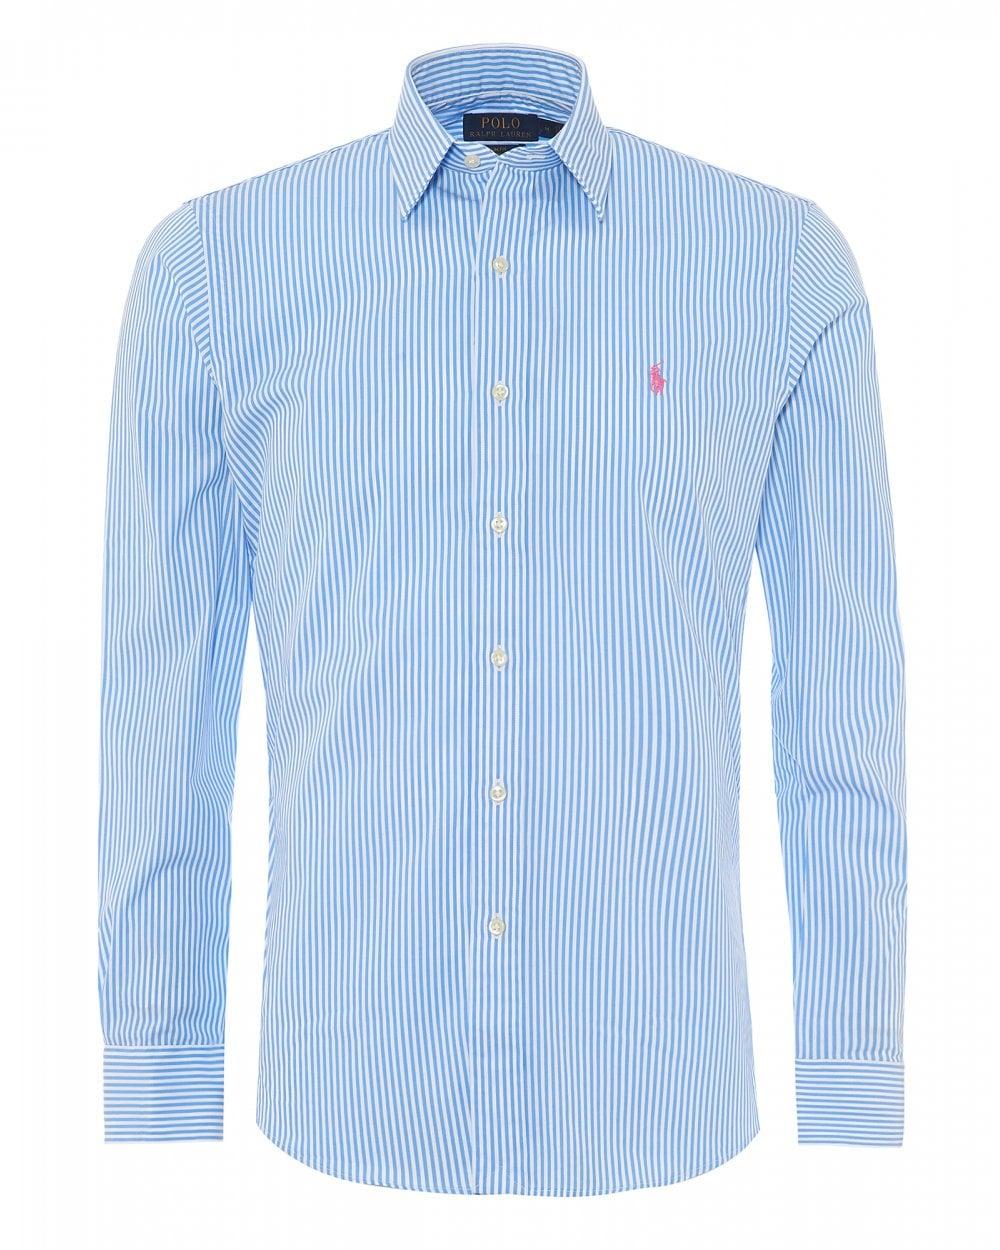 dfe70019 Ralph Lauren Men Fine Stripe Powder Blue White Slim Shirt